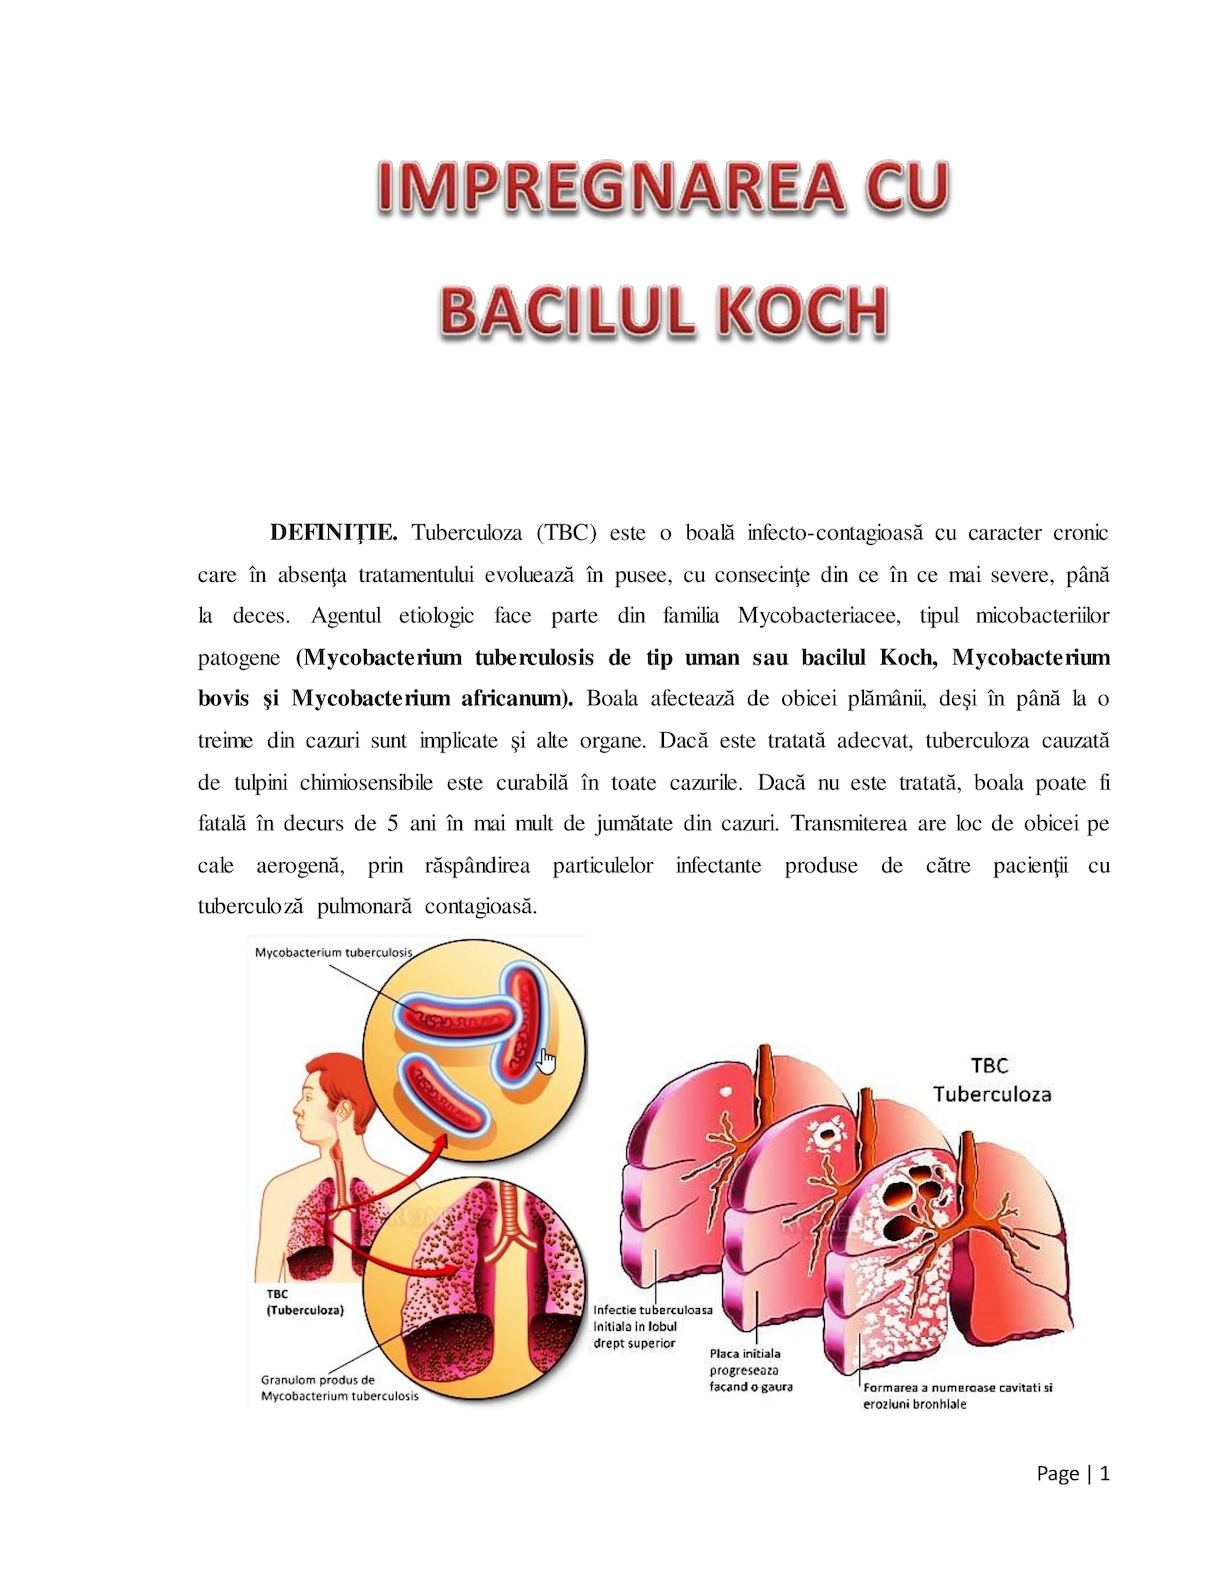 Tuberculoza: Factori de risc, diagnostic, tratament, preventie | Bioclinica